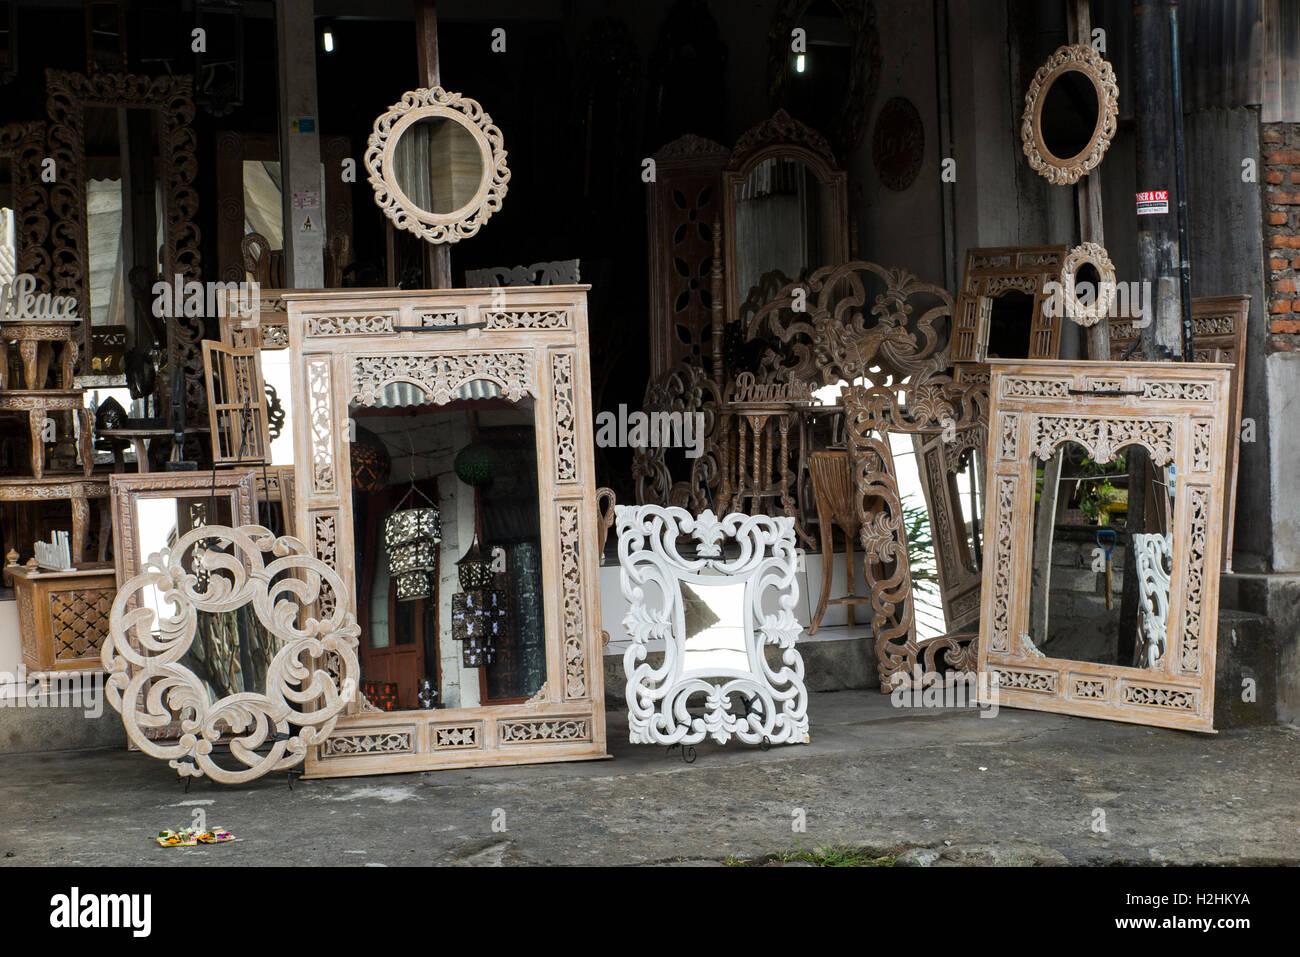 Indonesia, Bali, Mas, Shop Selling Furniture Made For European Market Export